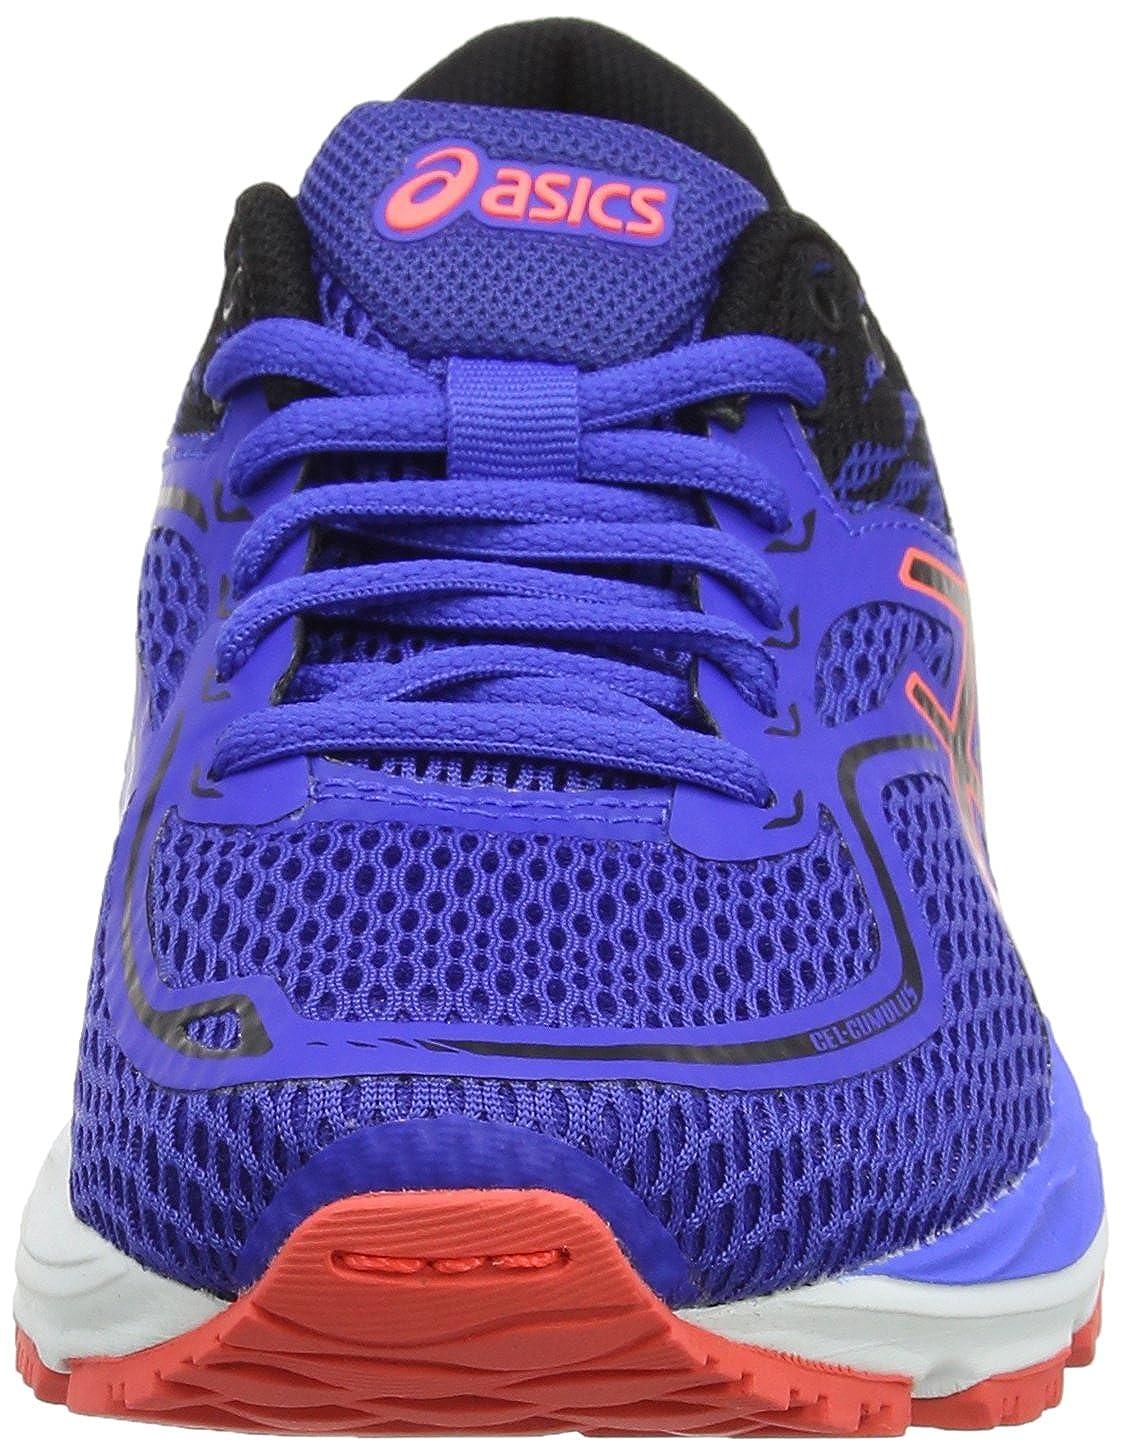 Asics Shoes uk Gs co Running 19 Unisex Cumulus Gel Amazon Kids' 0Uqr0